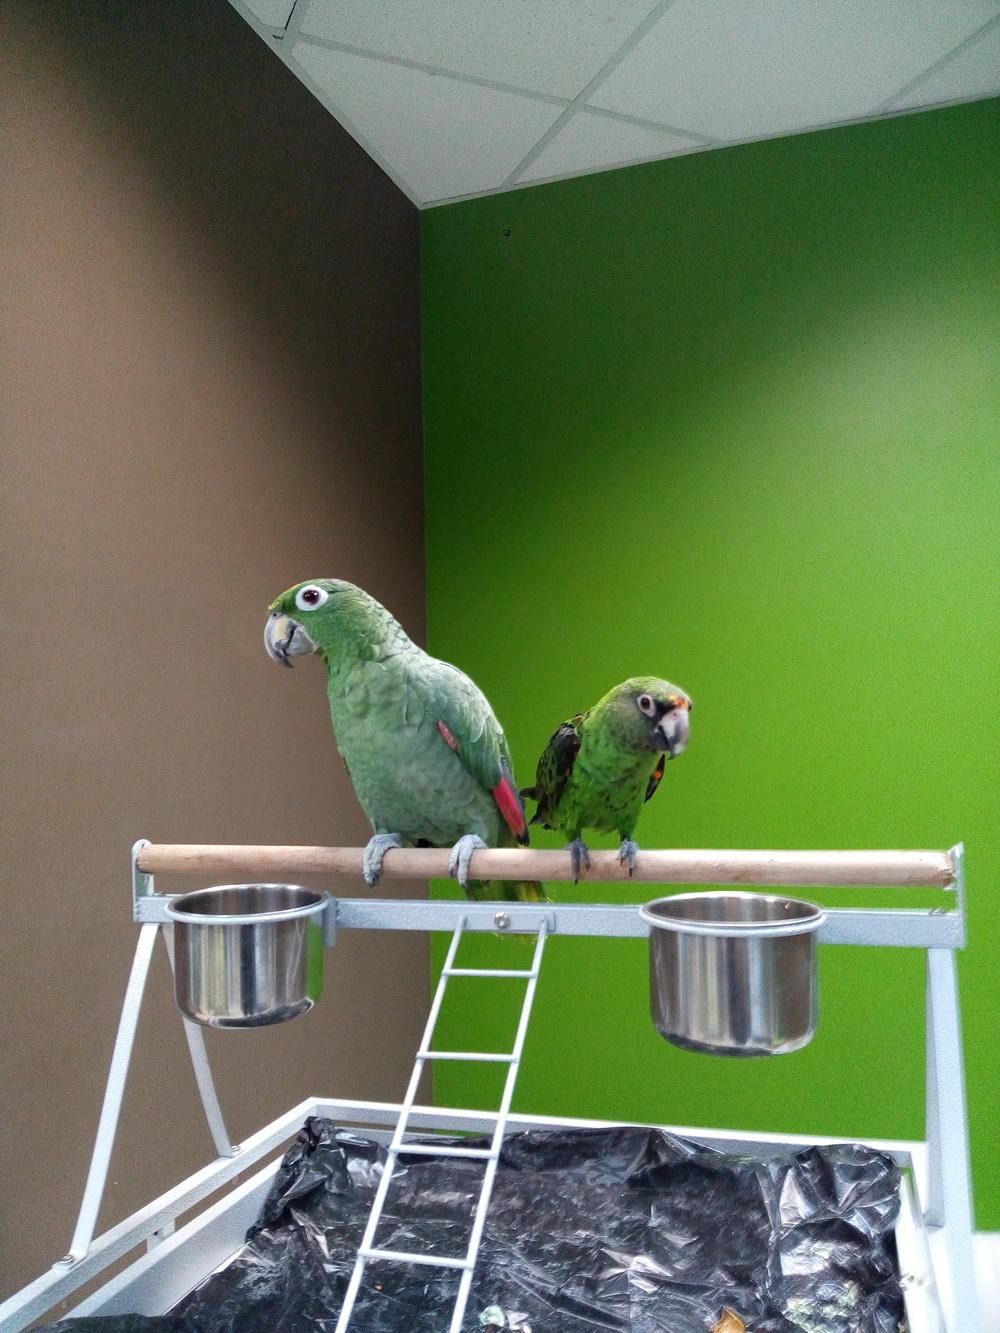 Юмор ворона гот попугай пидр